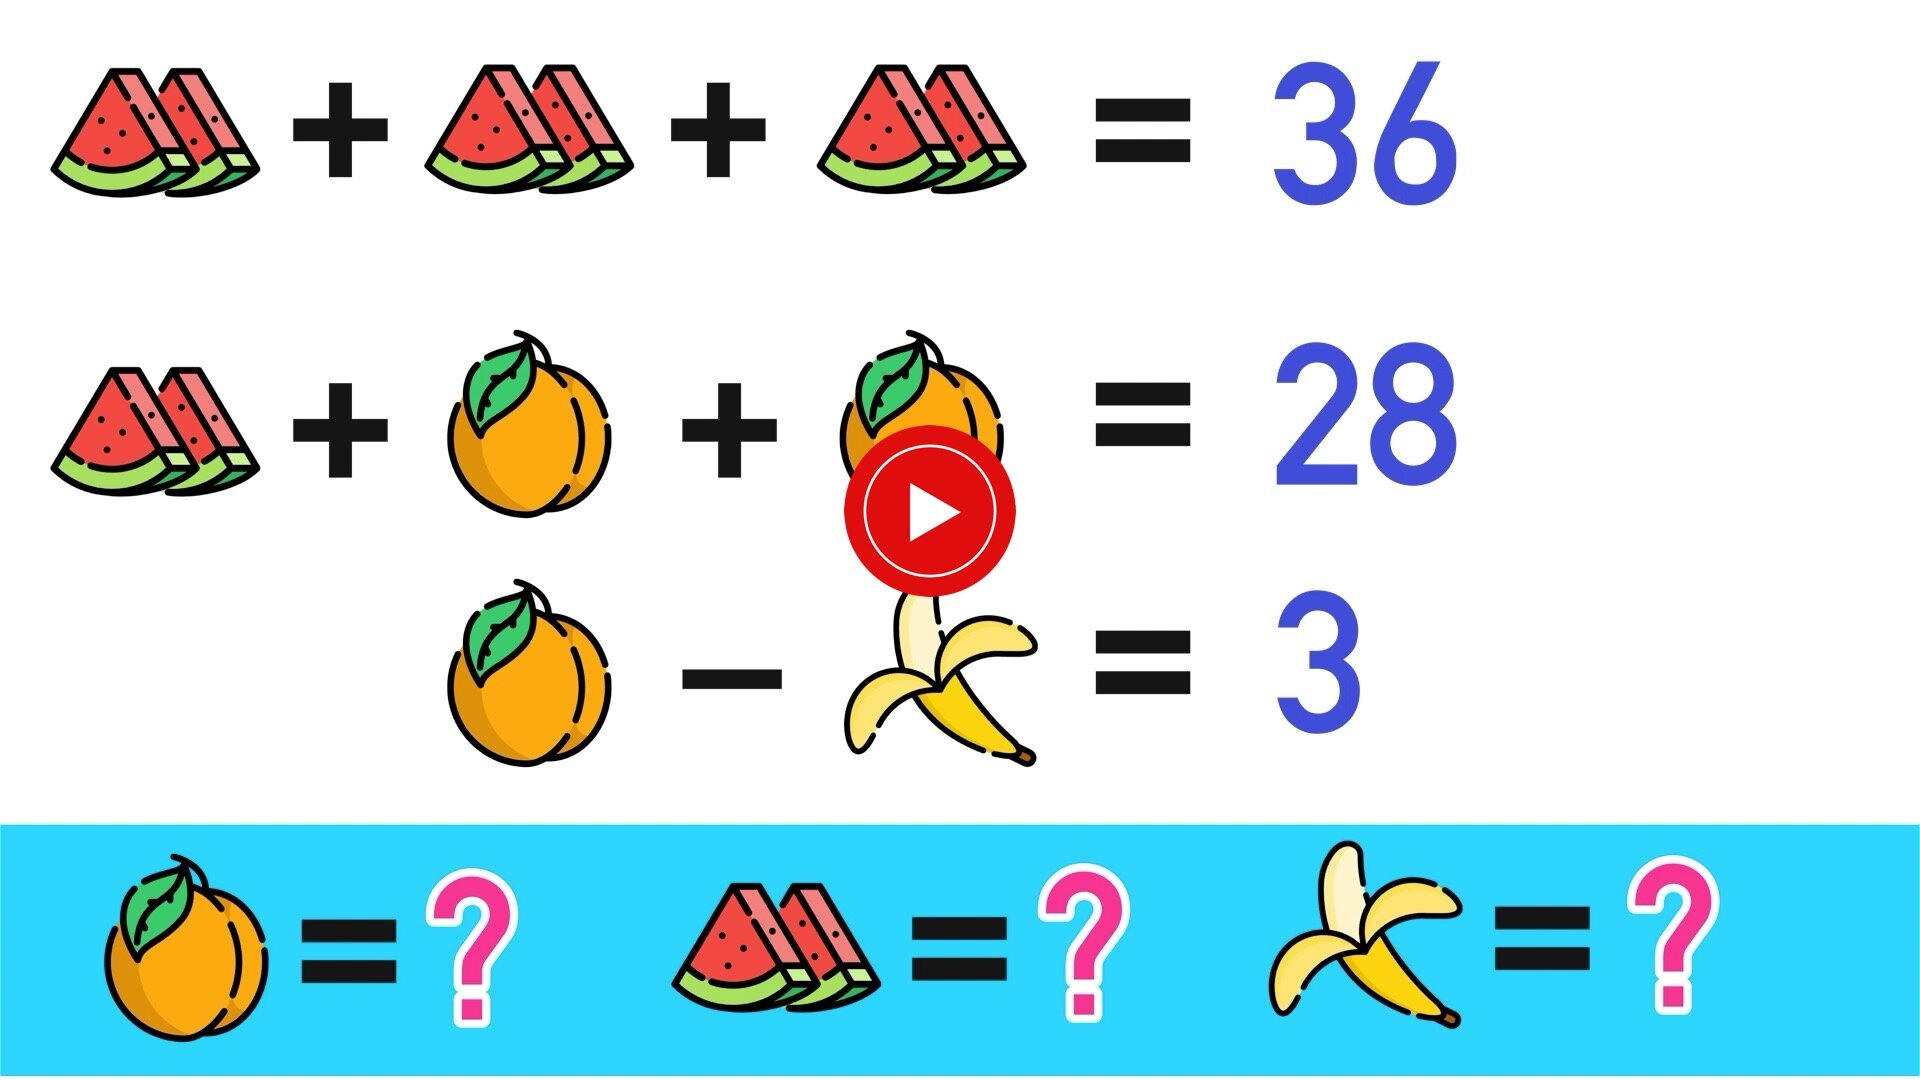 7 Super Fun Math Logic Puzzles For Kids! — Mashup Math